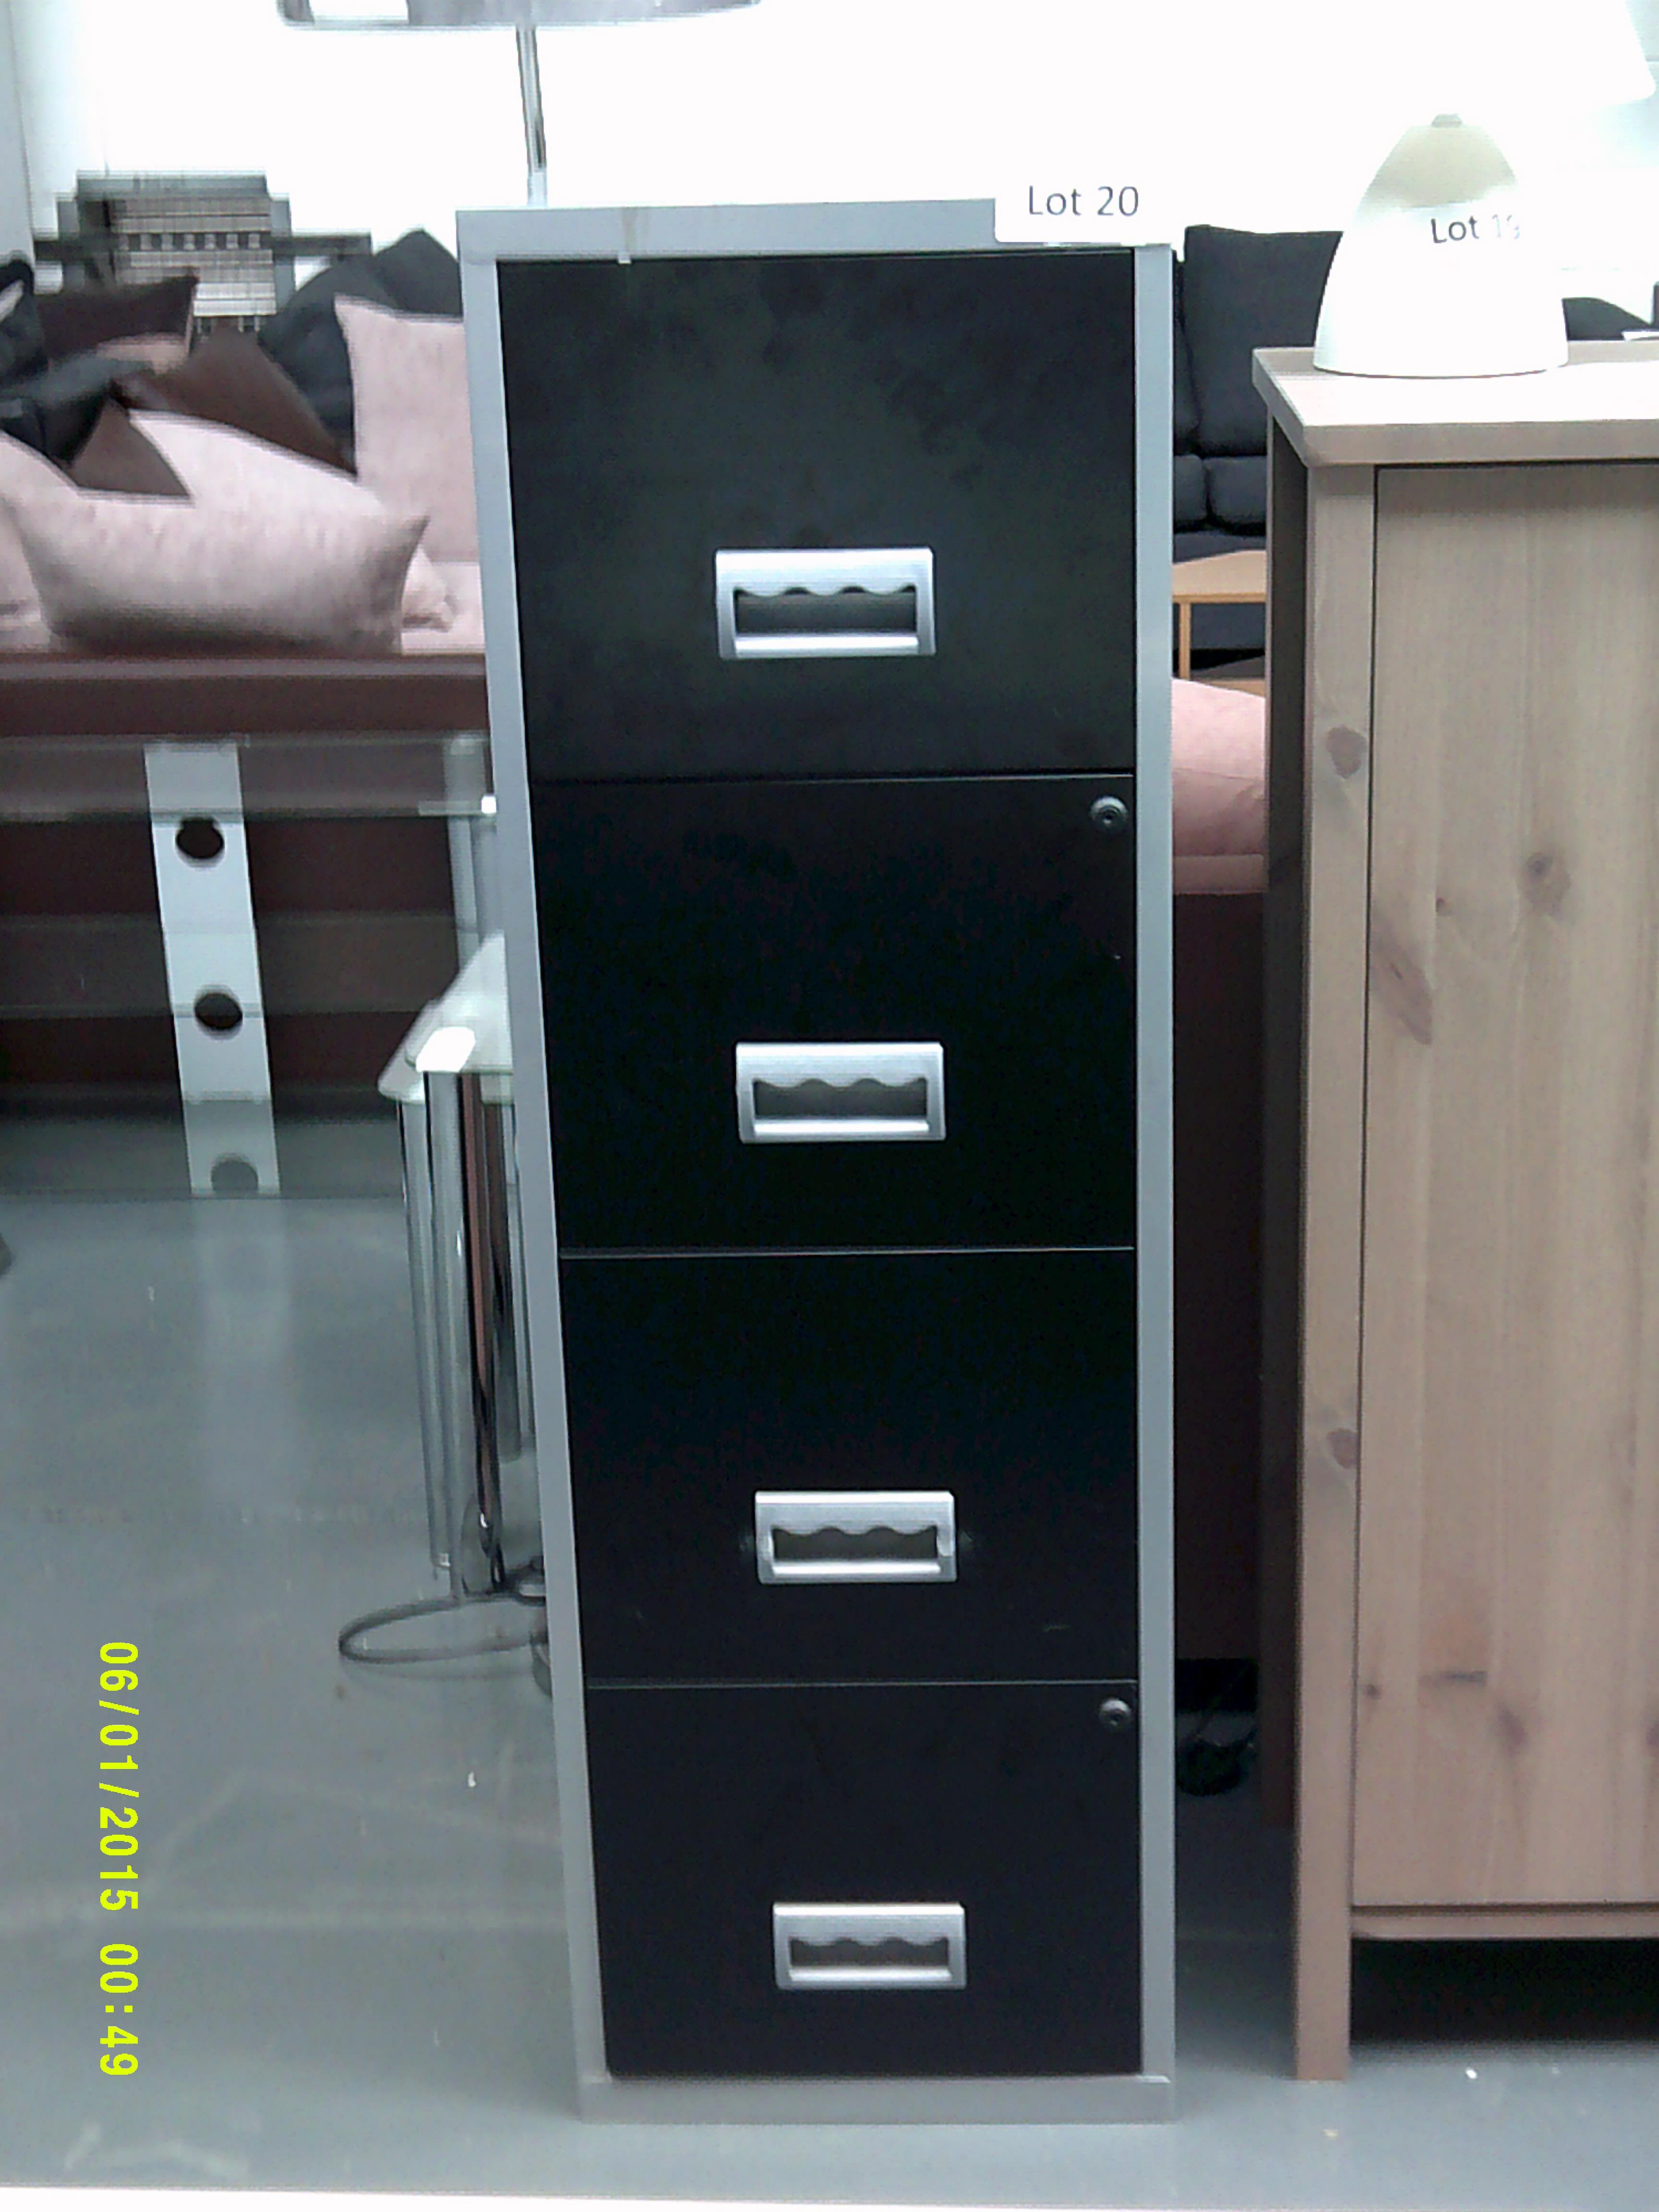 Lot 20 - Black & Grey 4 Drawer Filming Cabinet Customer Returns